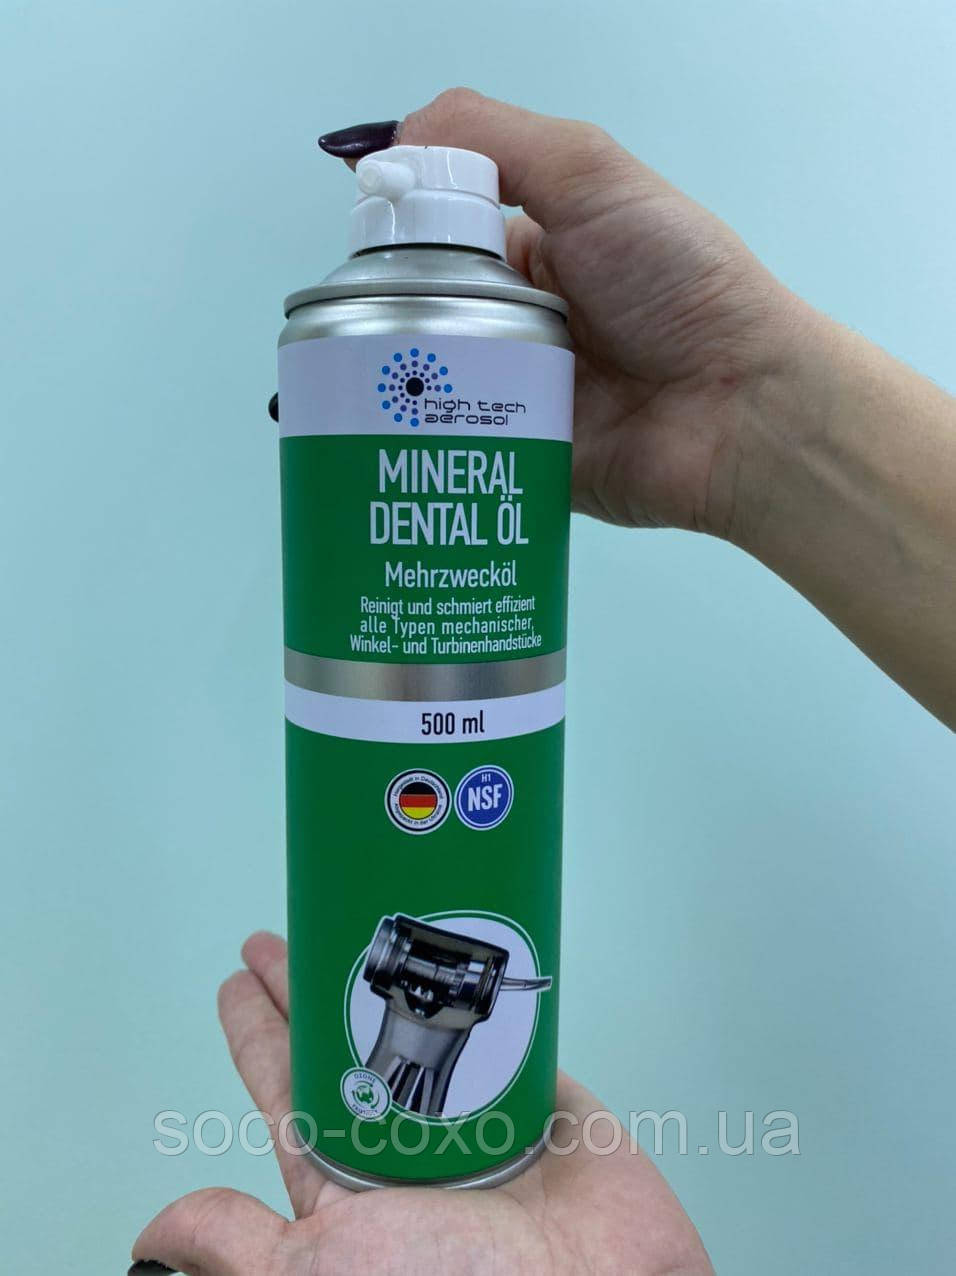 Смазка спрей для стоматологических наконечников MINERAL DENTAL OIL (Минирал Дентал Оил) 500 мл